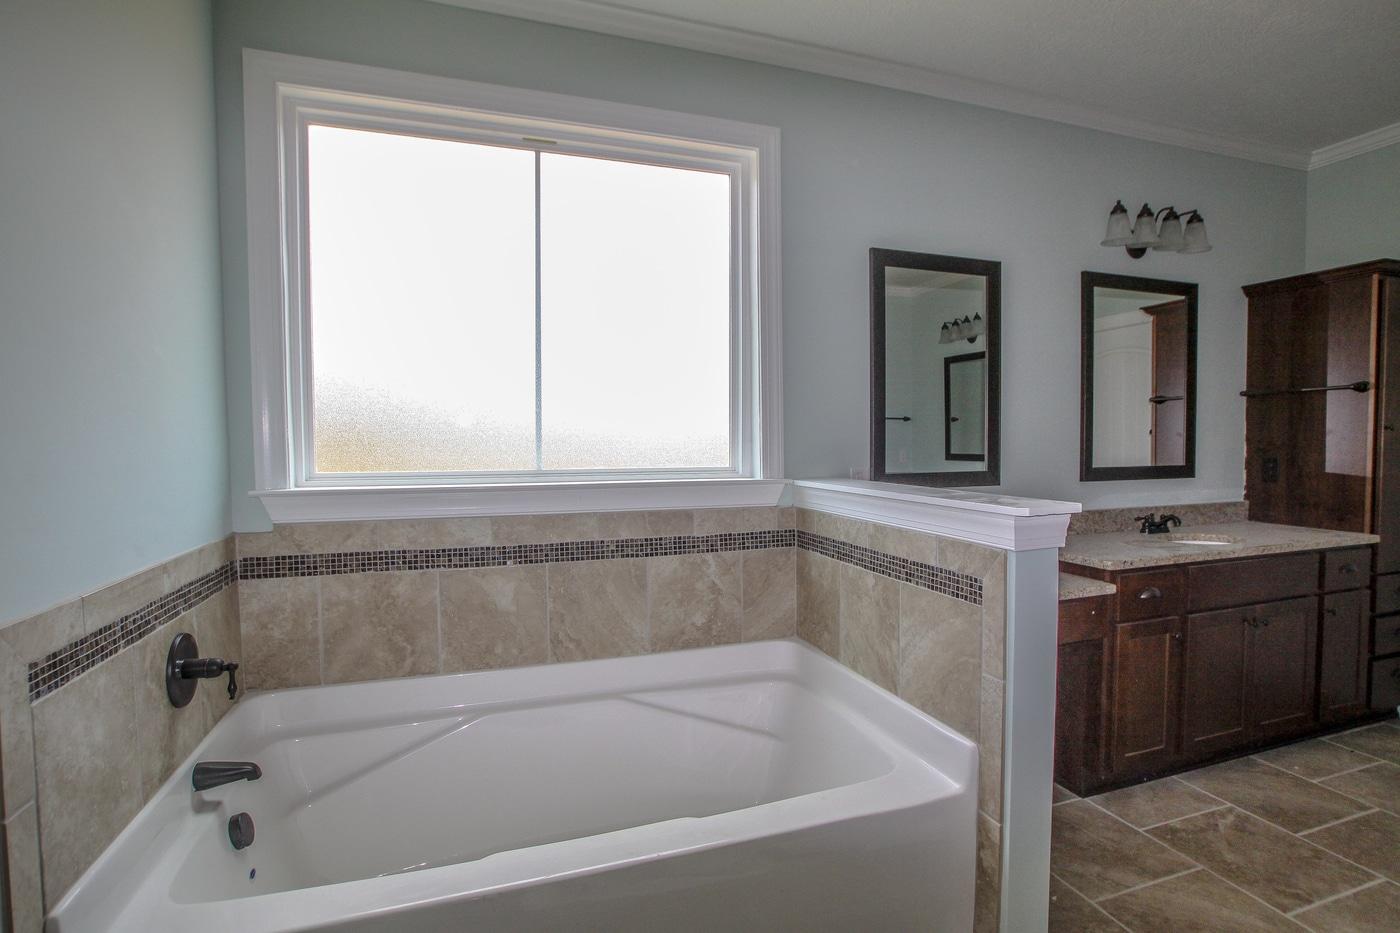 An image of a Kelarie home bathroom tub.